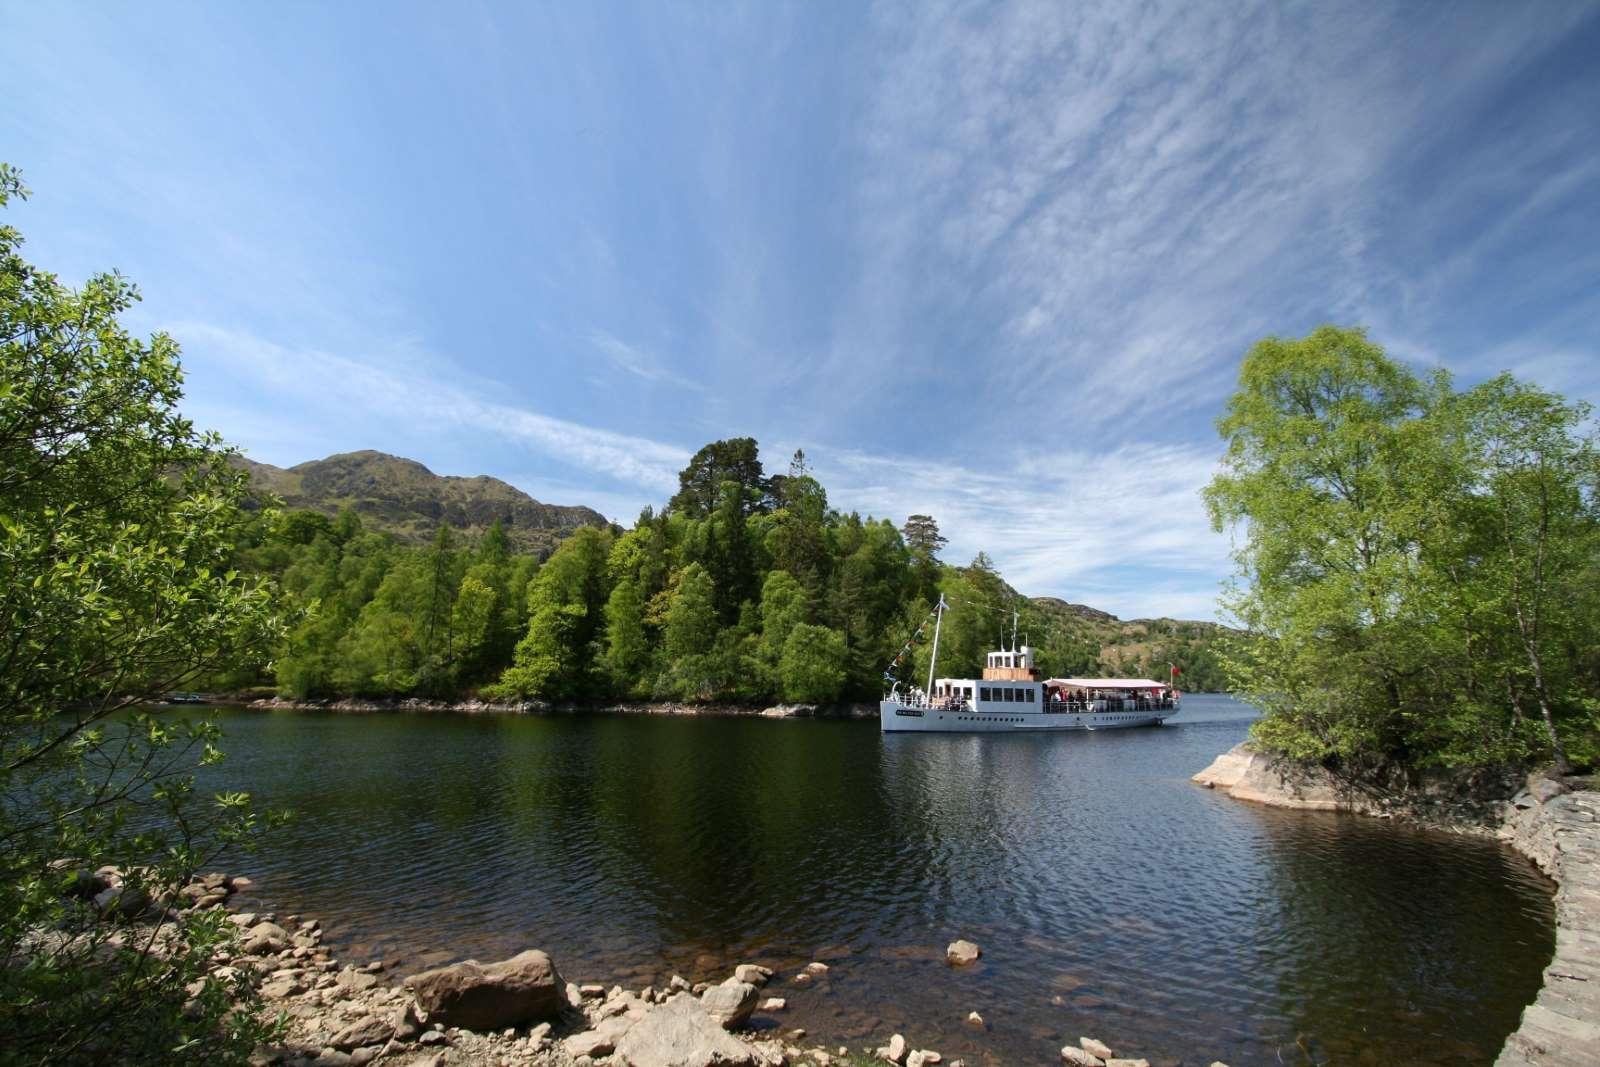 Loch Katrine steamship cruises